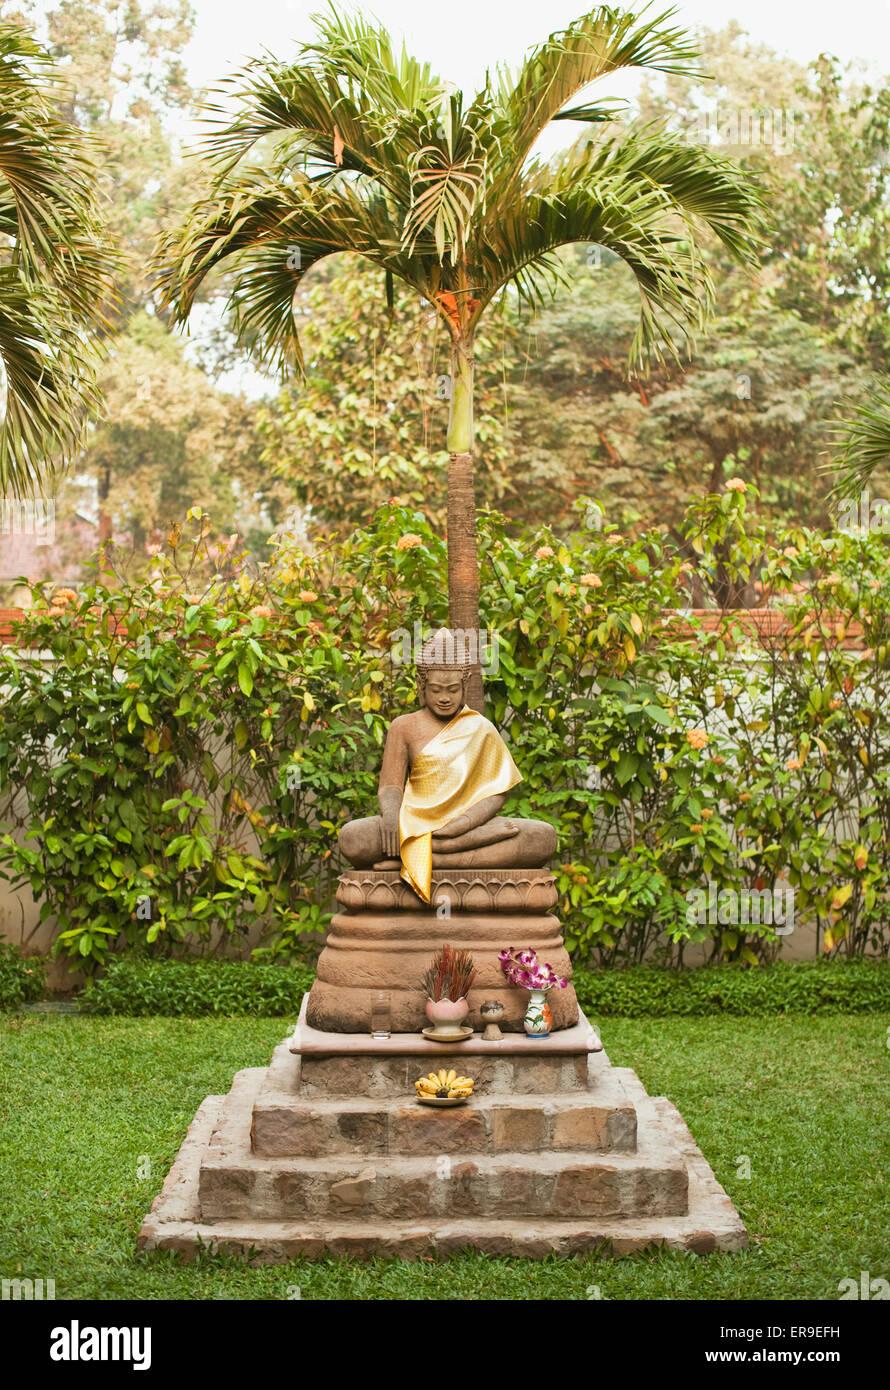 Buddha-Statuen in der Resort Garten von La Residence d ' Angkor, Siem Reap, Kambodscha. Stockbild